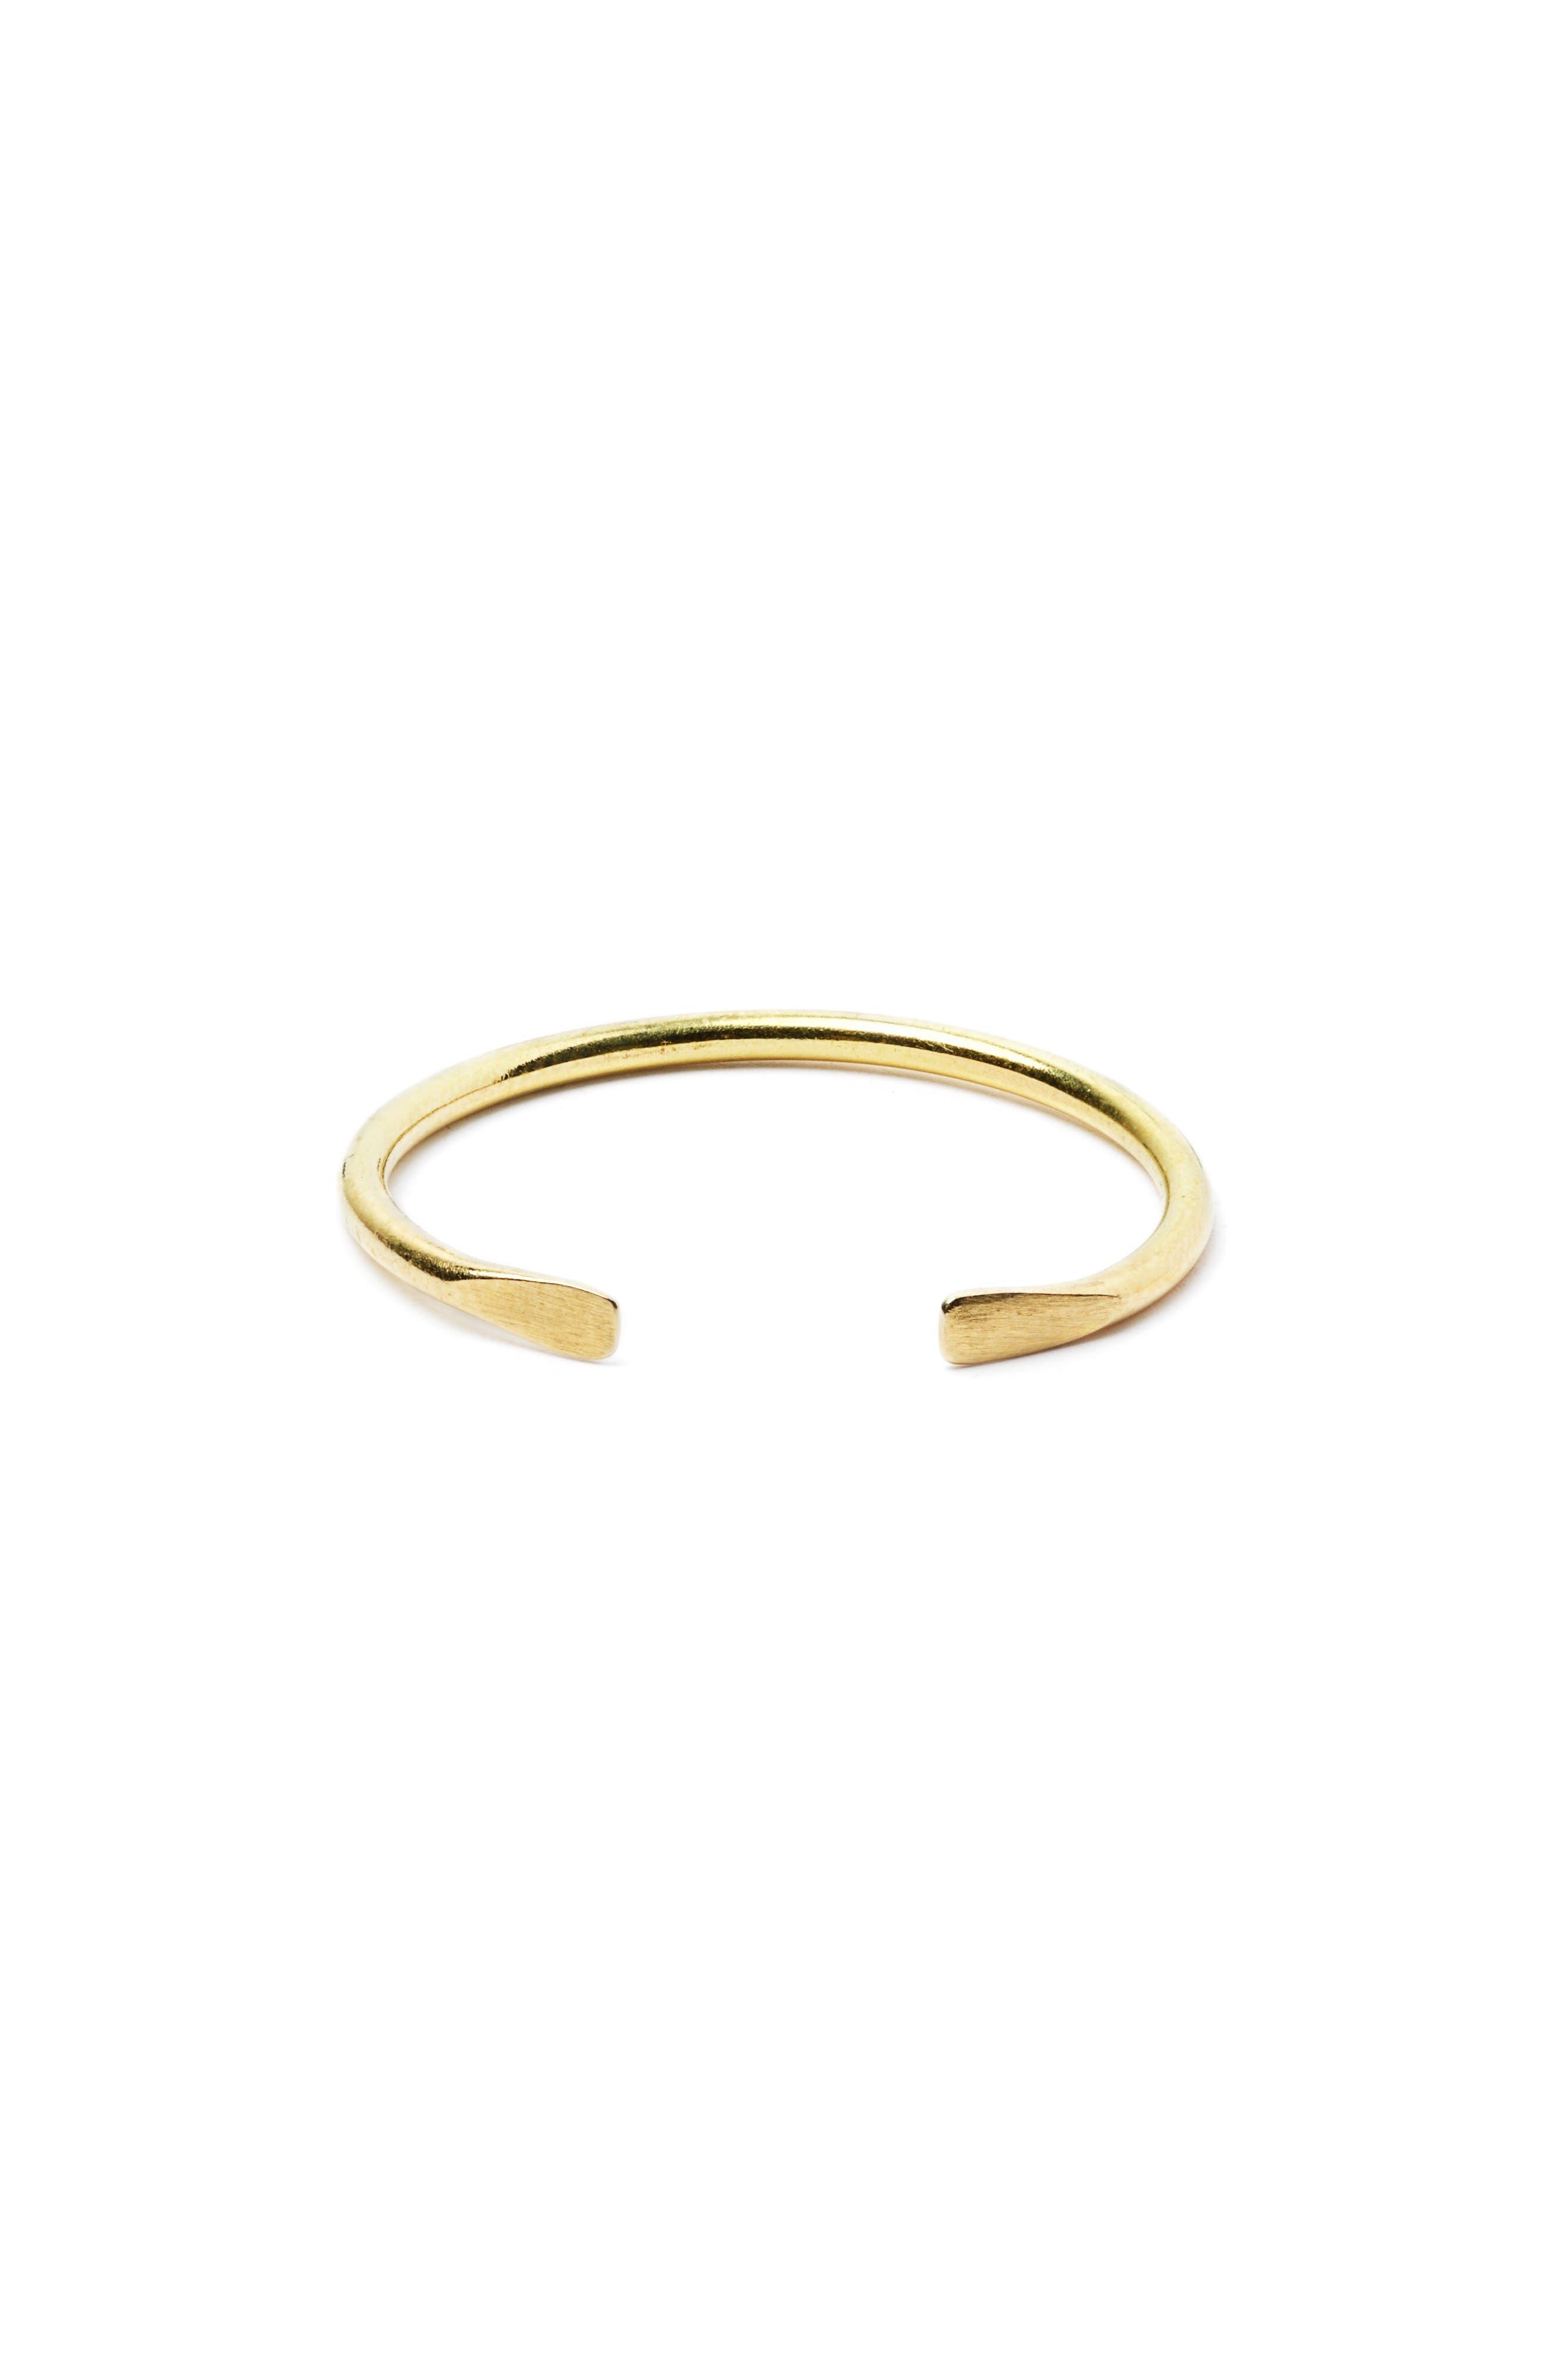 Adjustable 18k Gold Ring,                         Main,                         color,